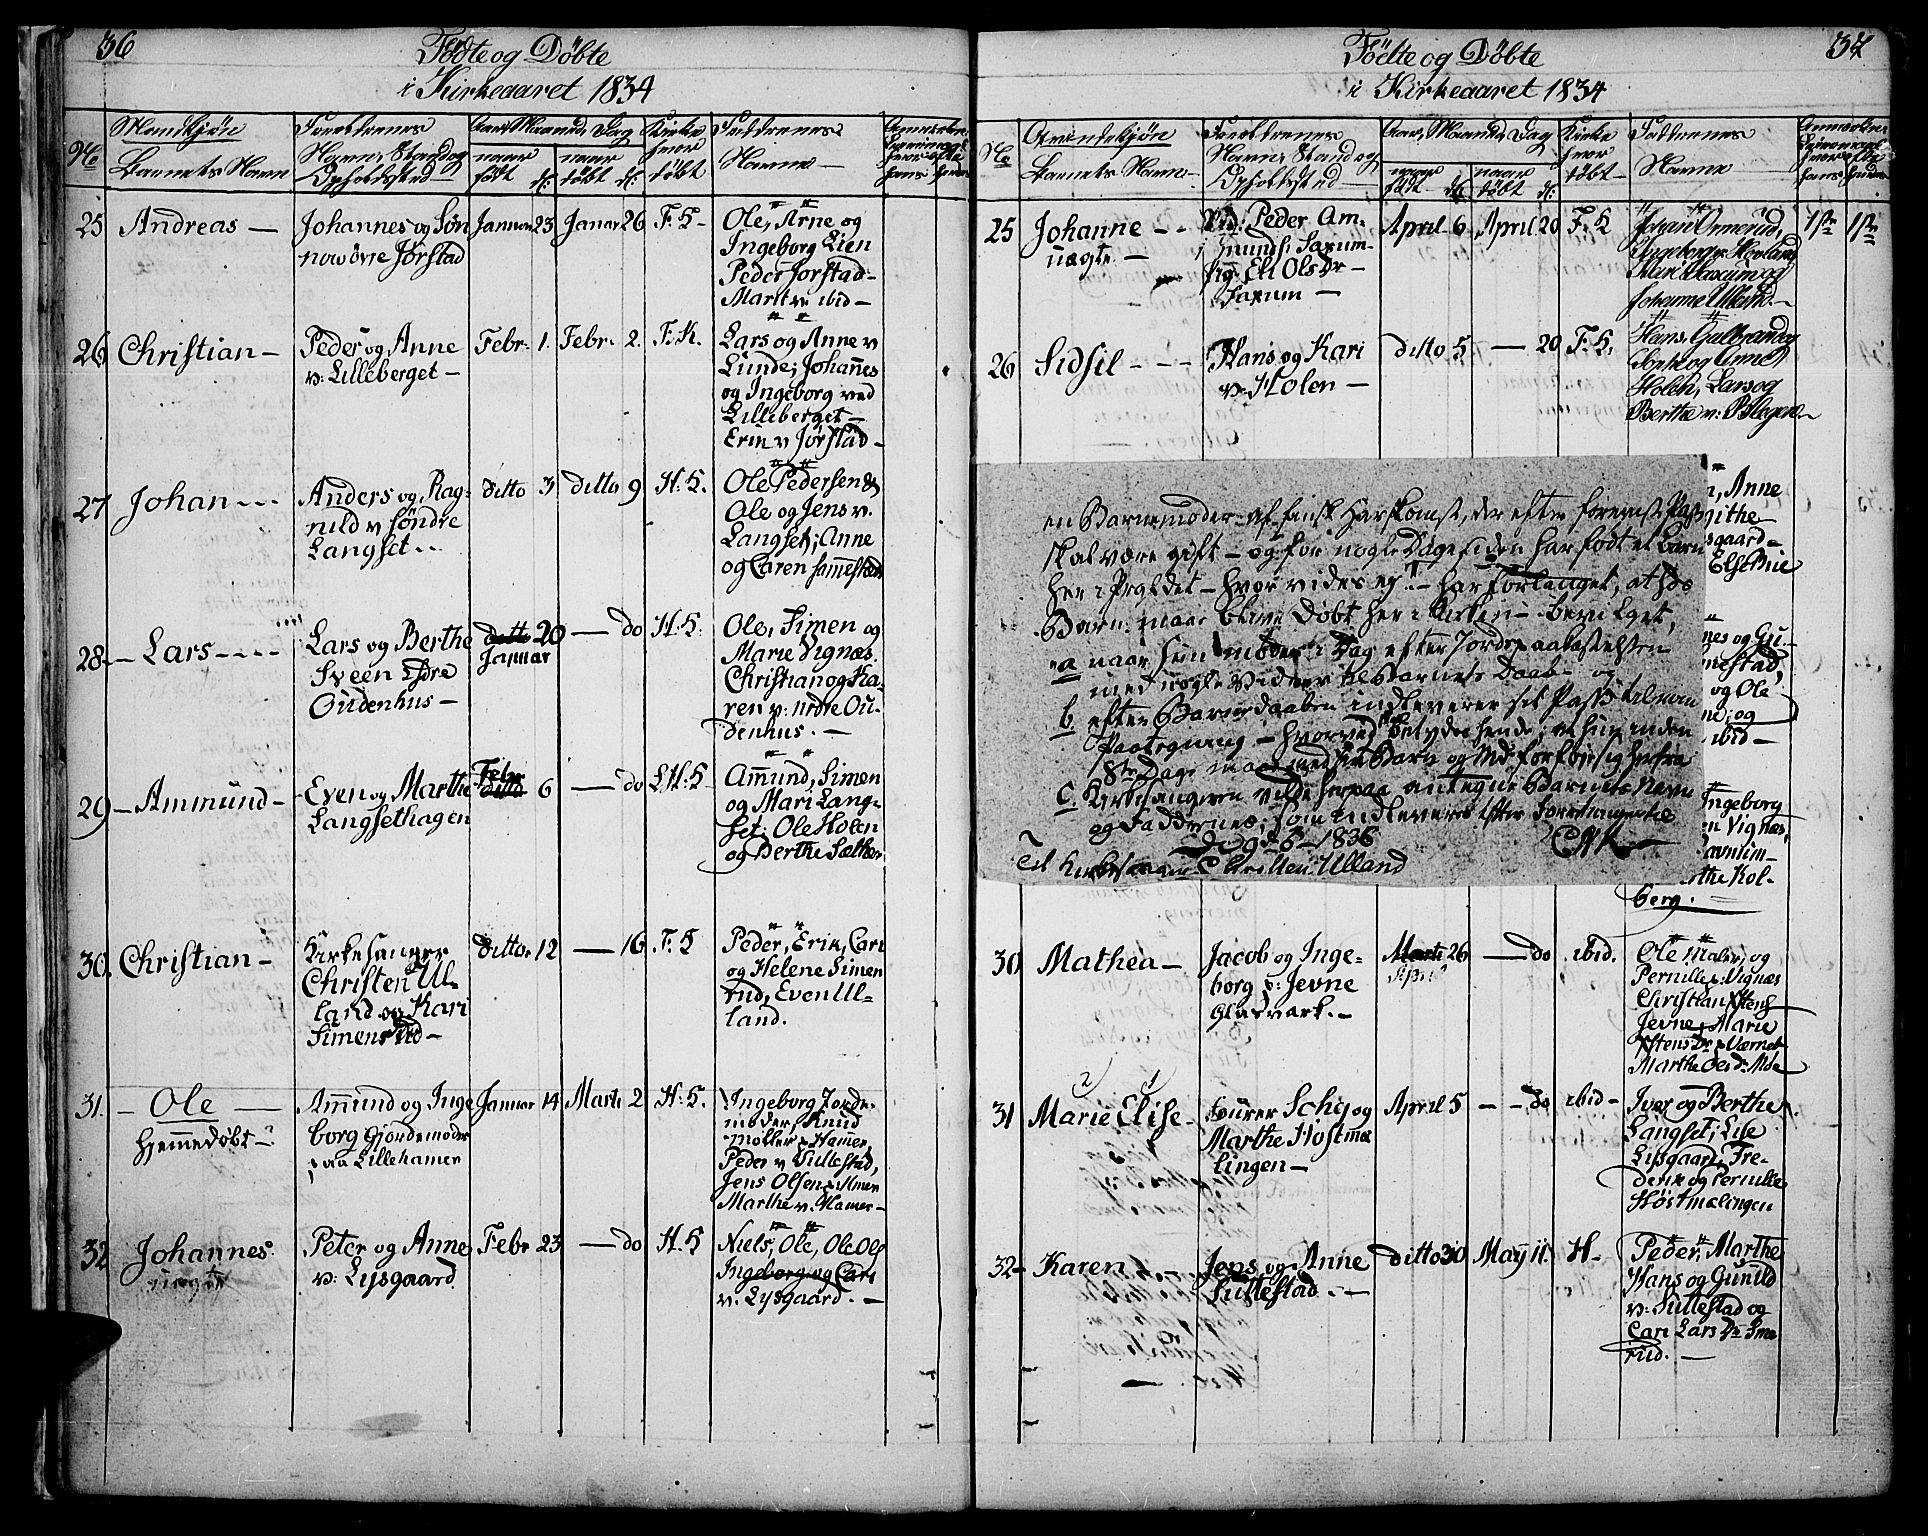 SAH, Fåberg prestekontor, Ministerialbok nr. 4, 1833-1837, s. 36-37